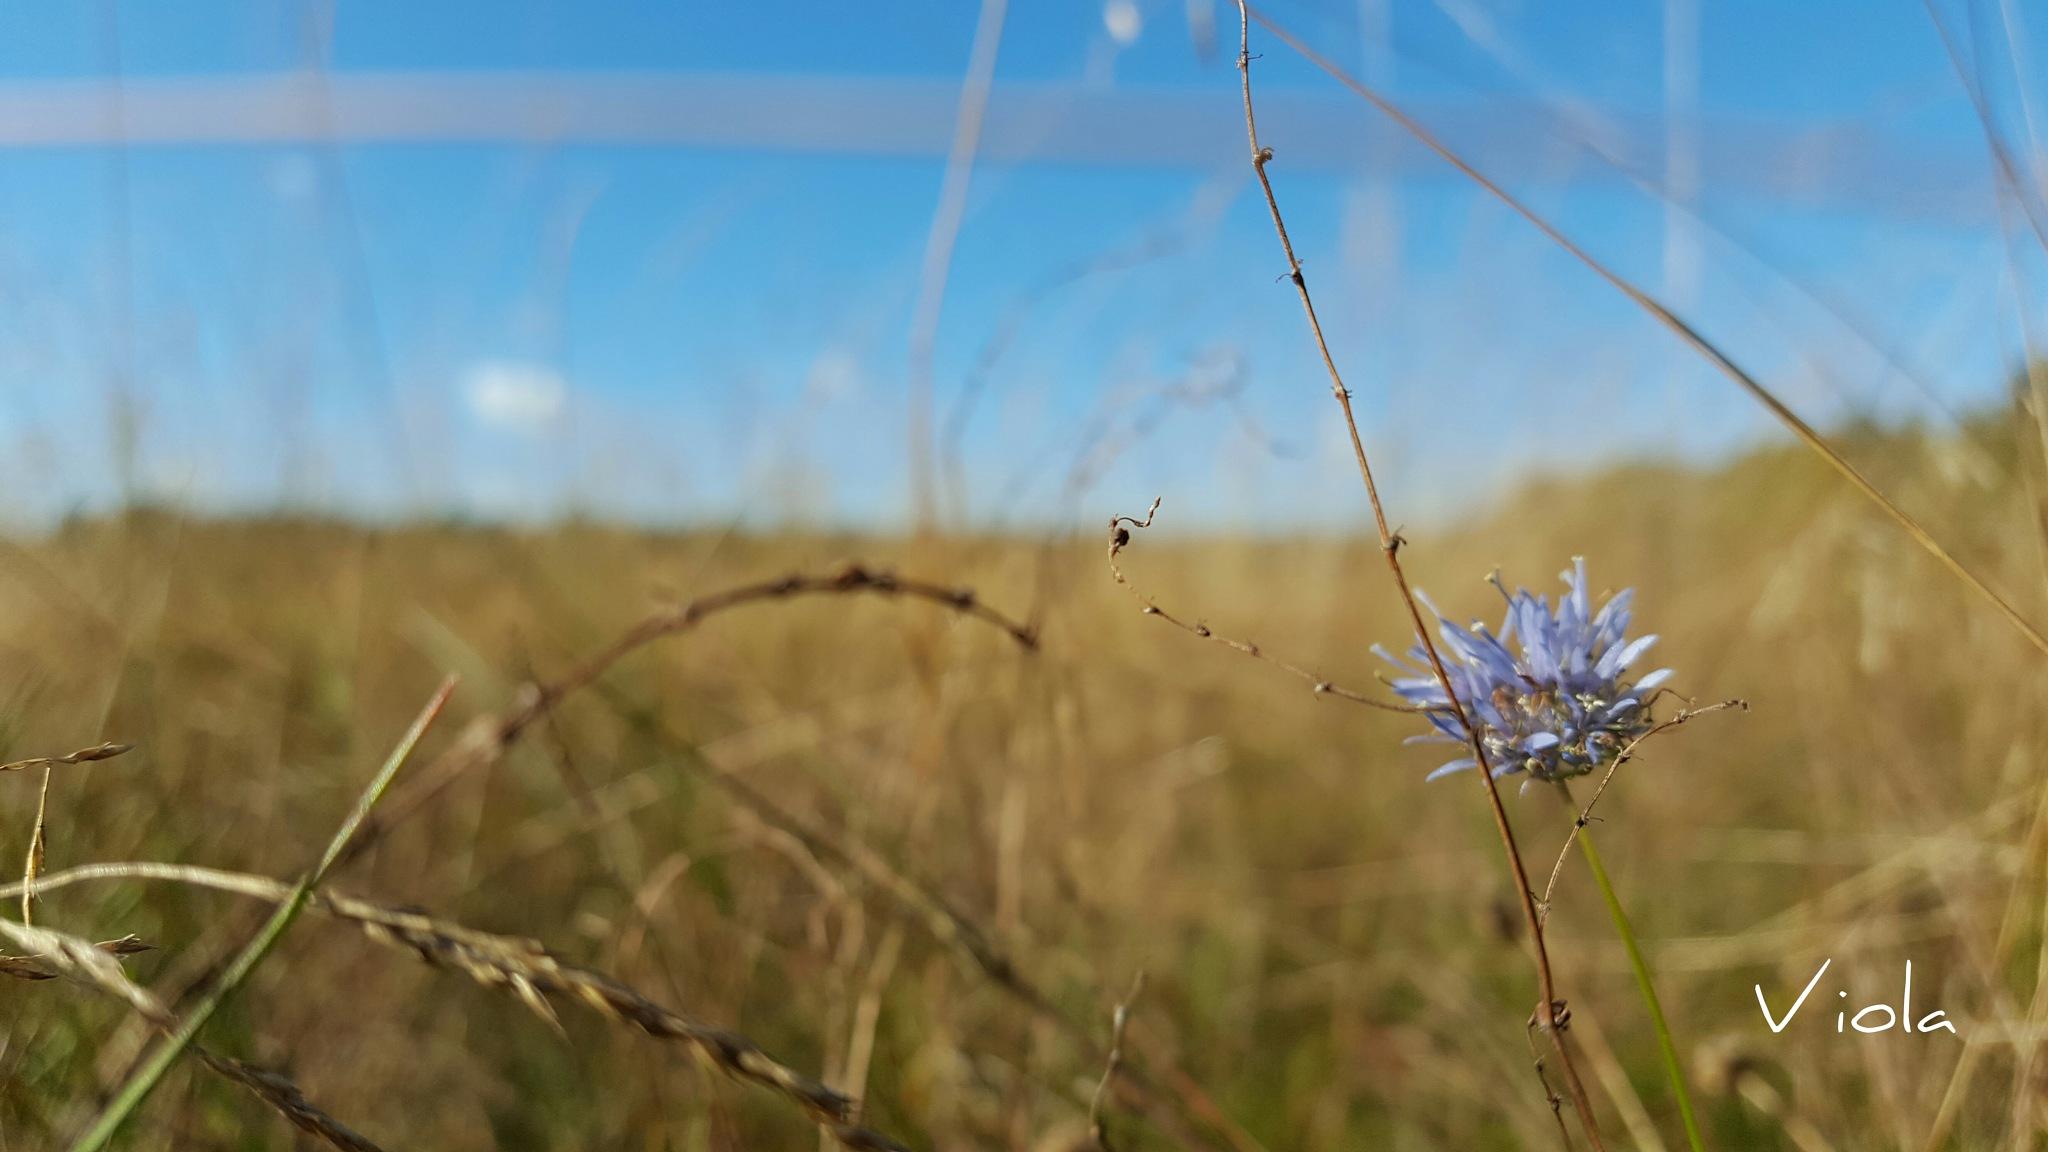 flora  by viola visbeen